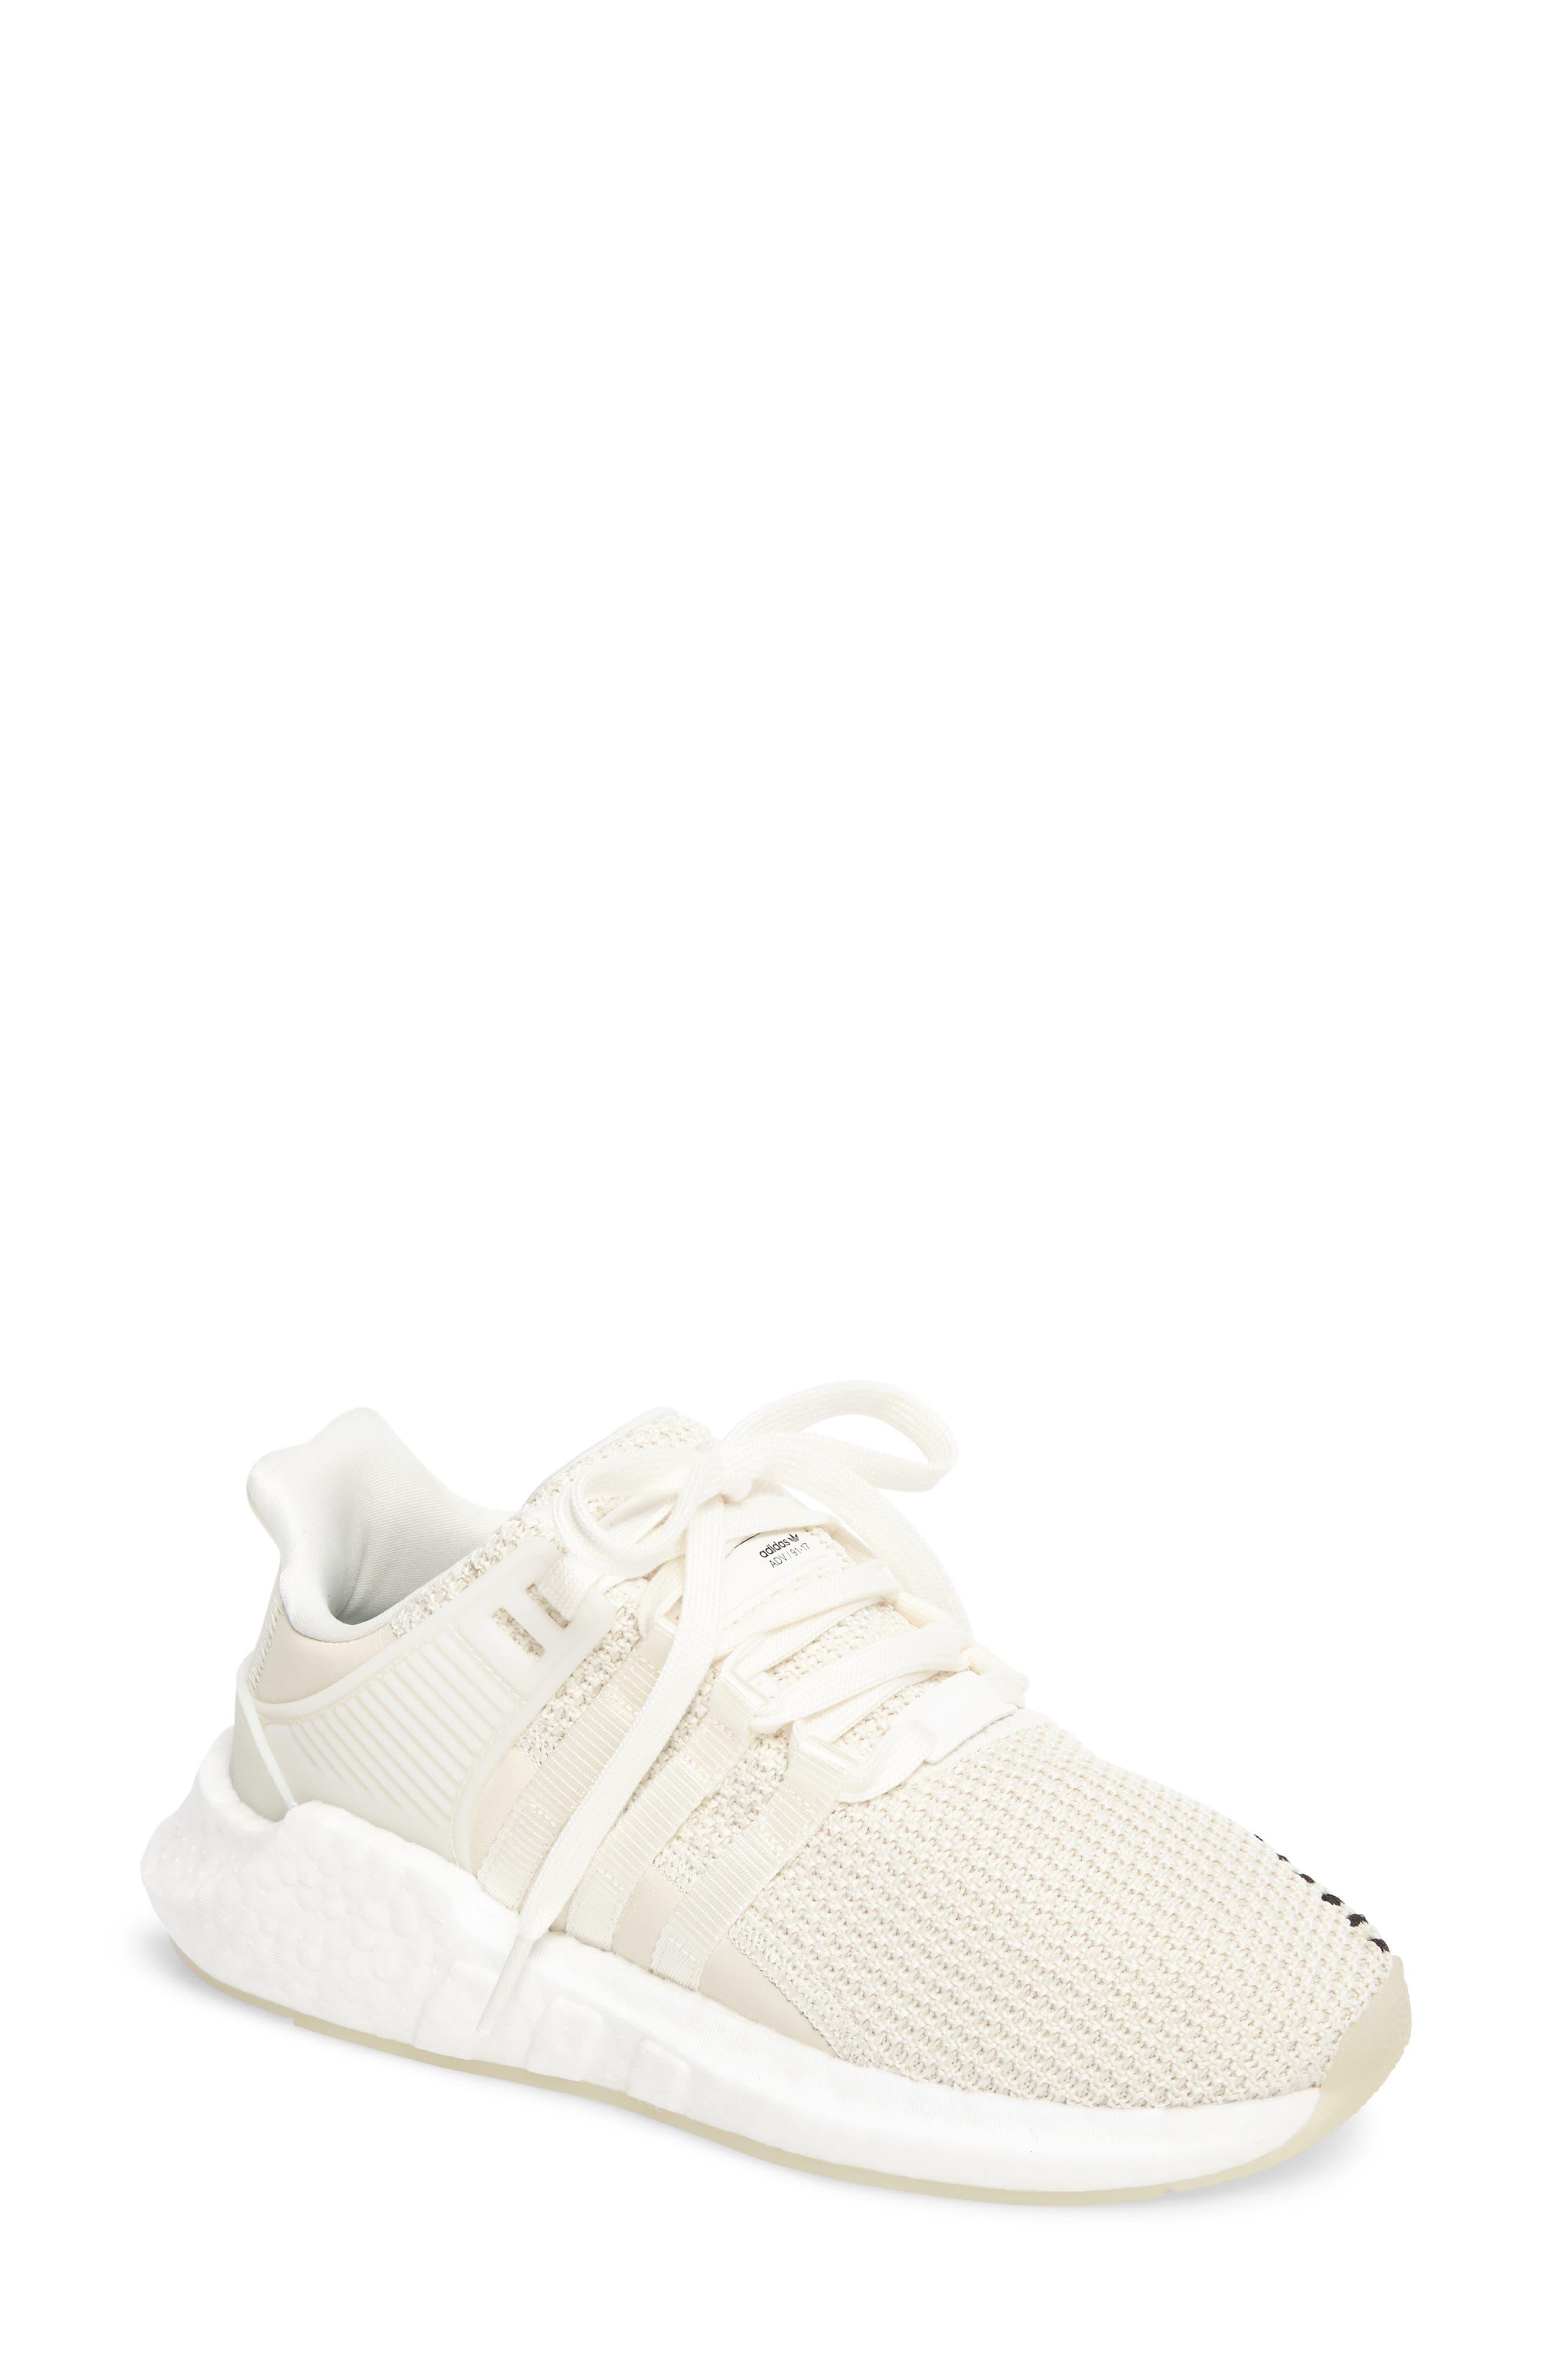 EQT Support 93/17 Sneaker,                             Main thumbnail 3, color,